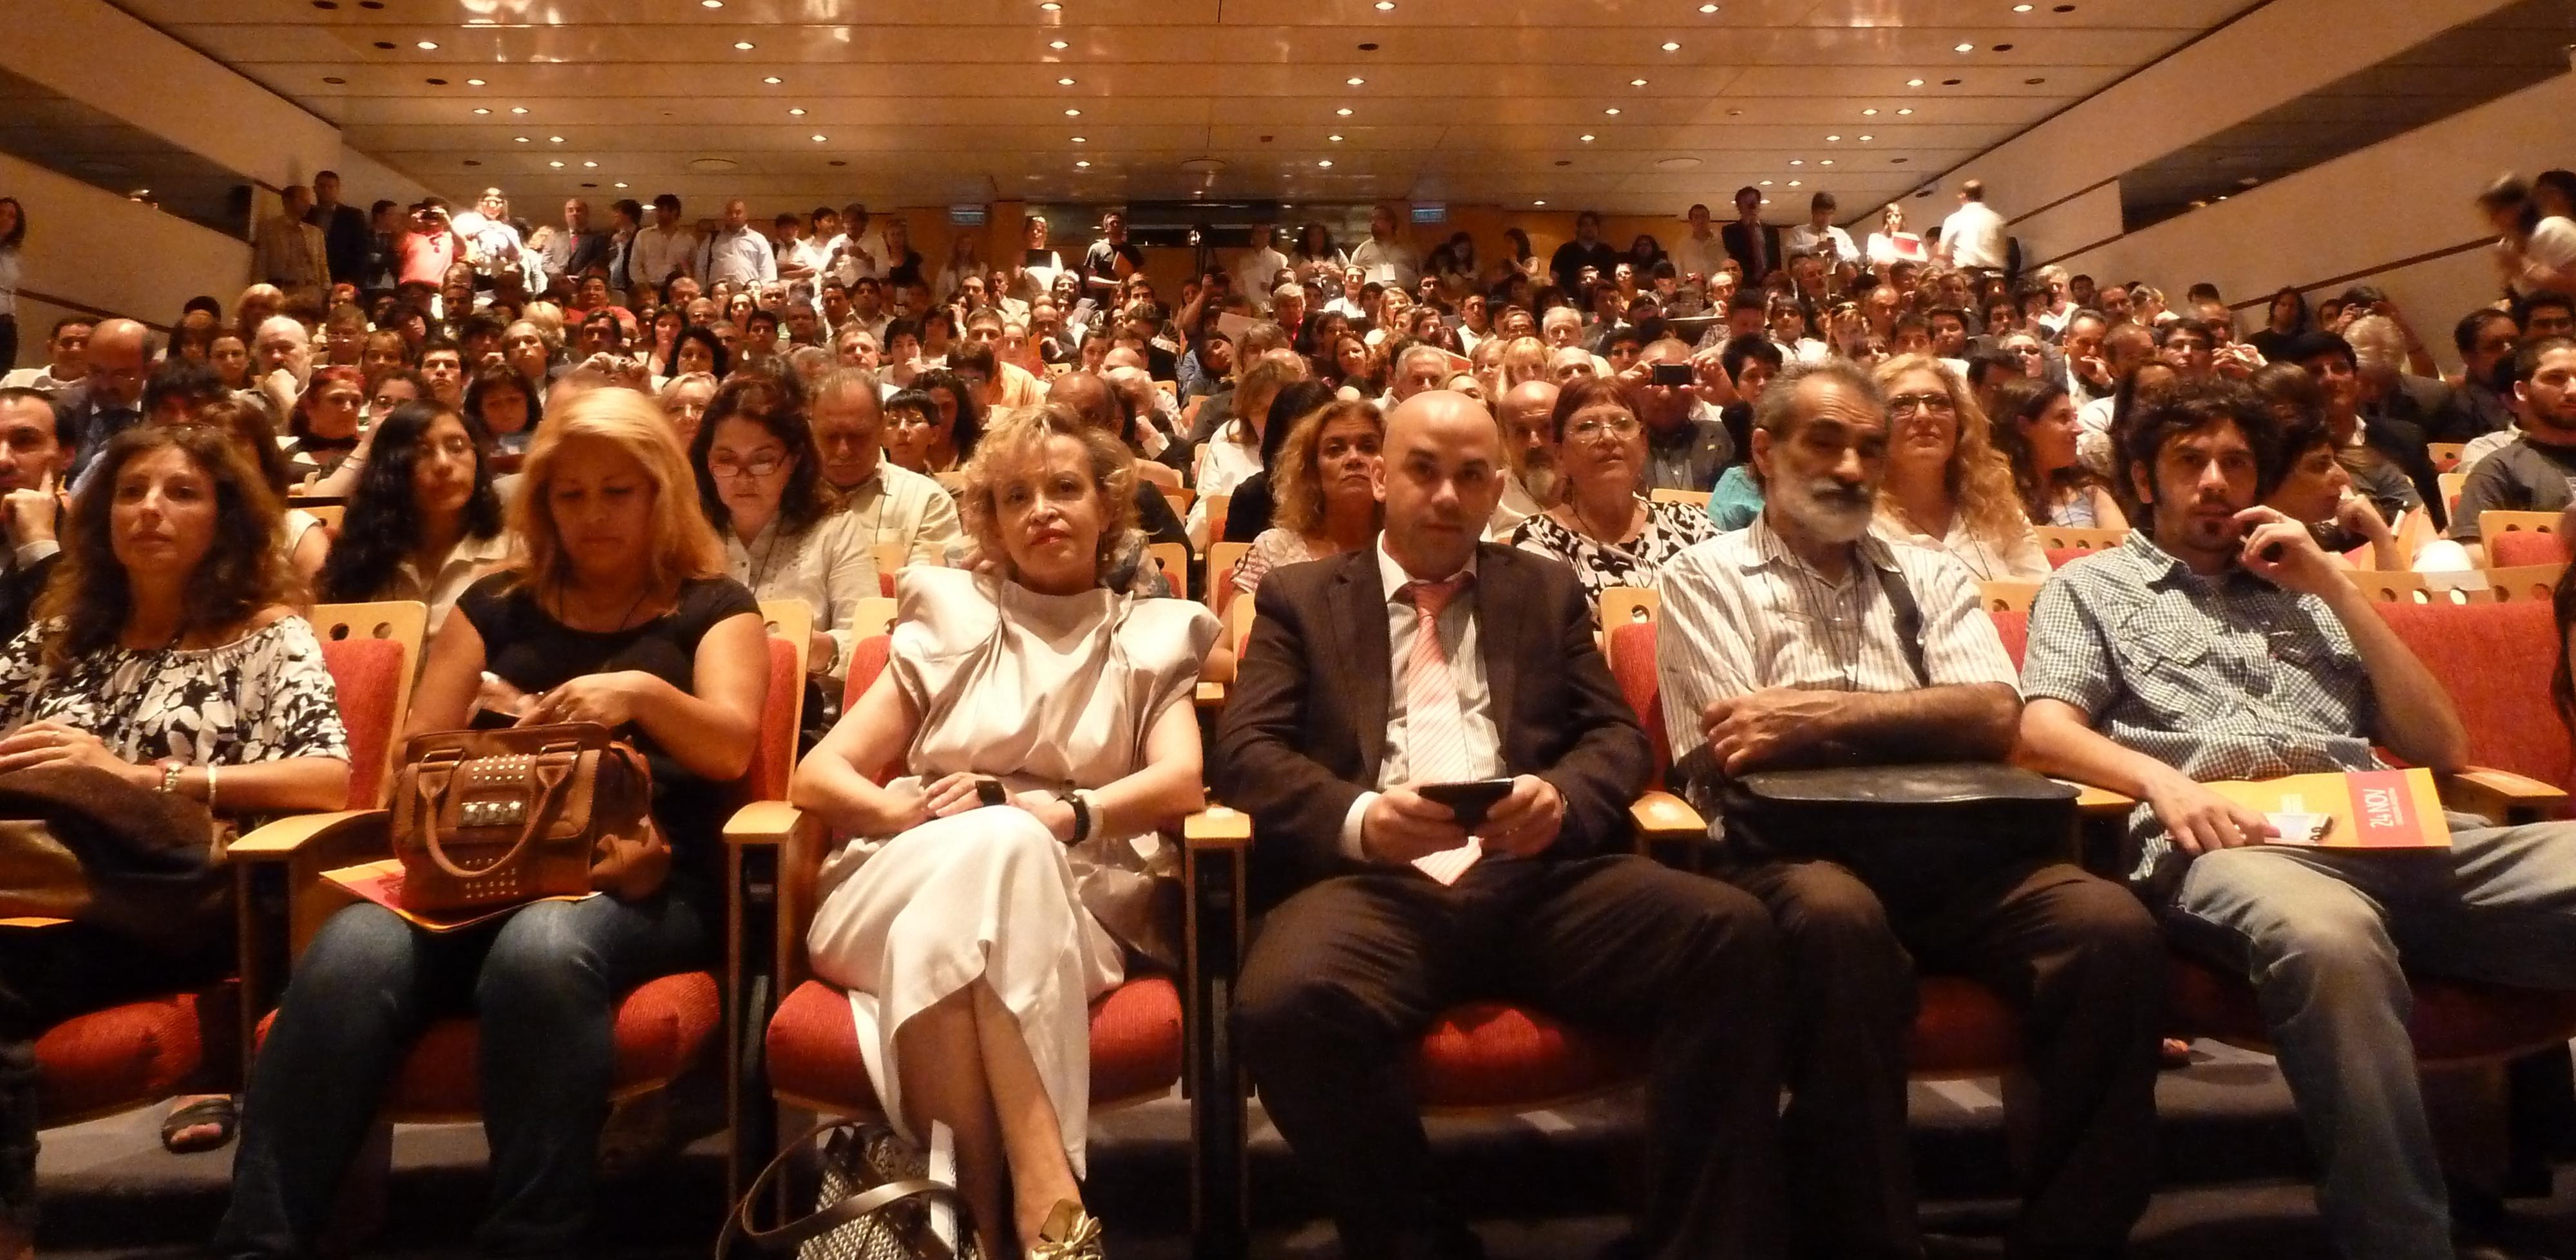 auditorio3.jpg